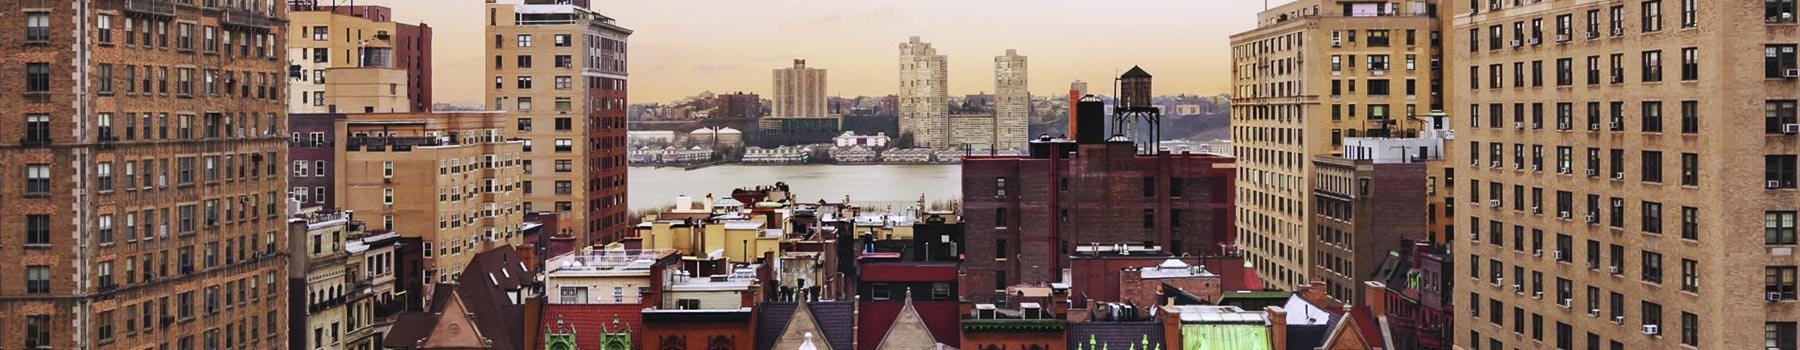 New-York Historical Society at New York